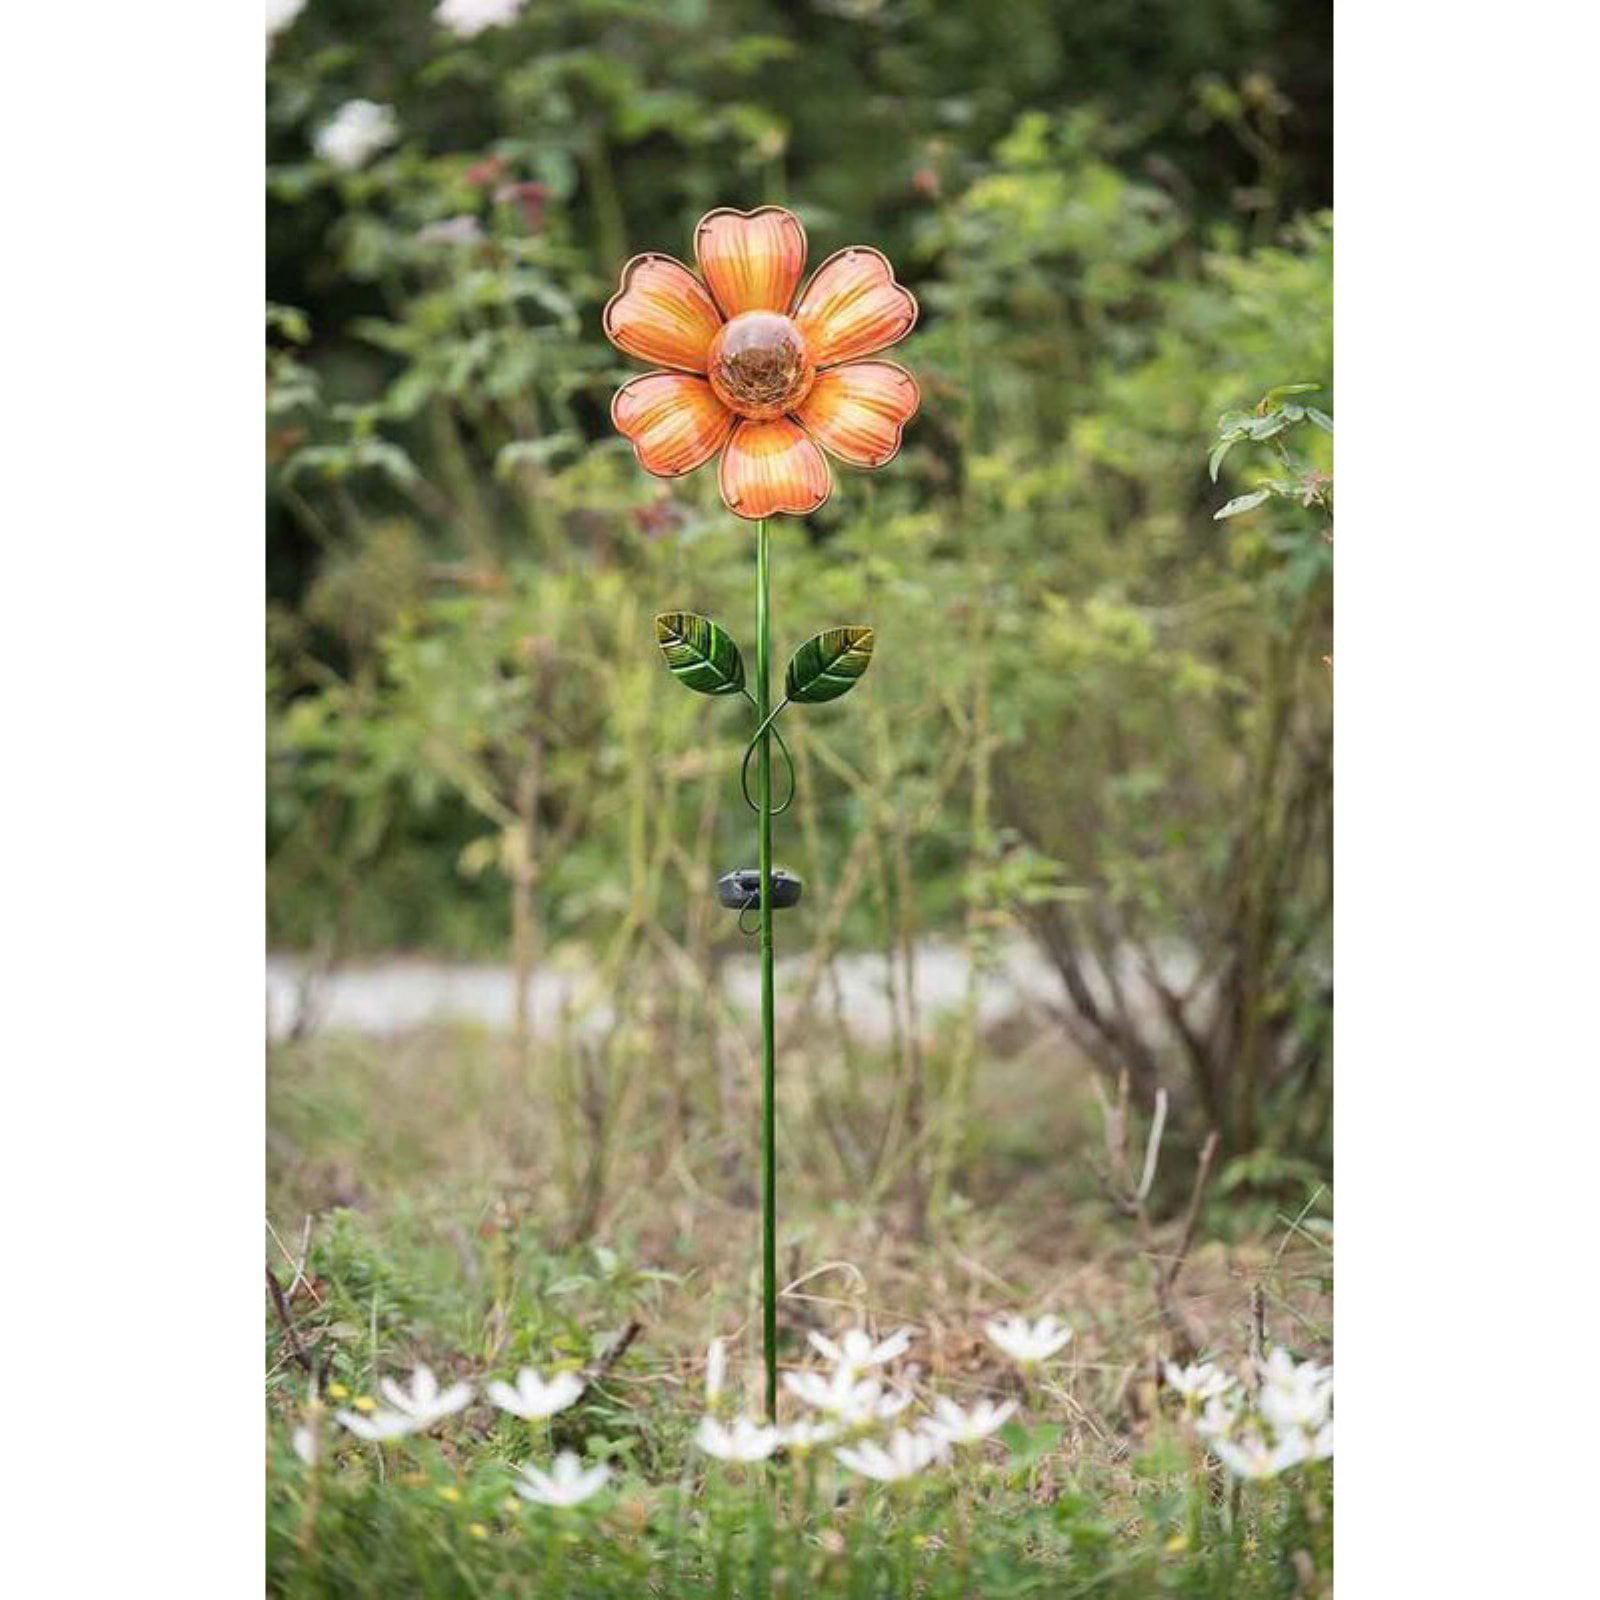 Sunjoy LED Solar Glass Flower Garden Stake by Sunjoy